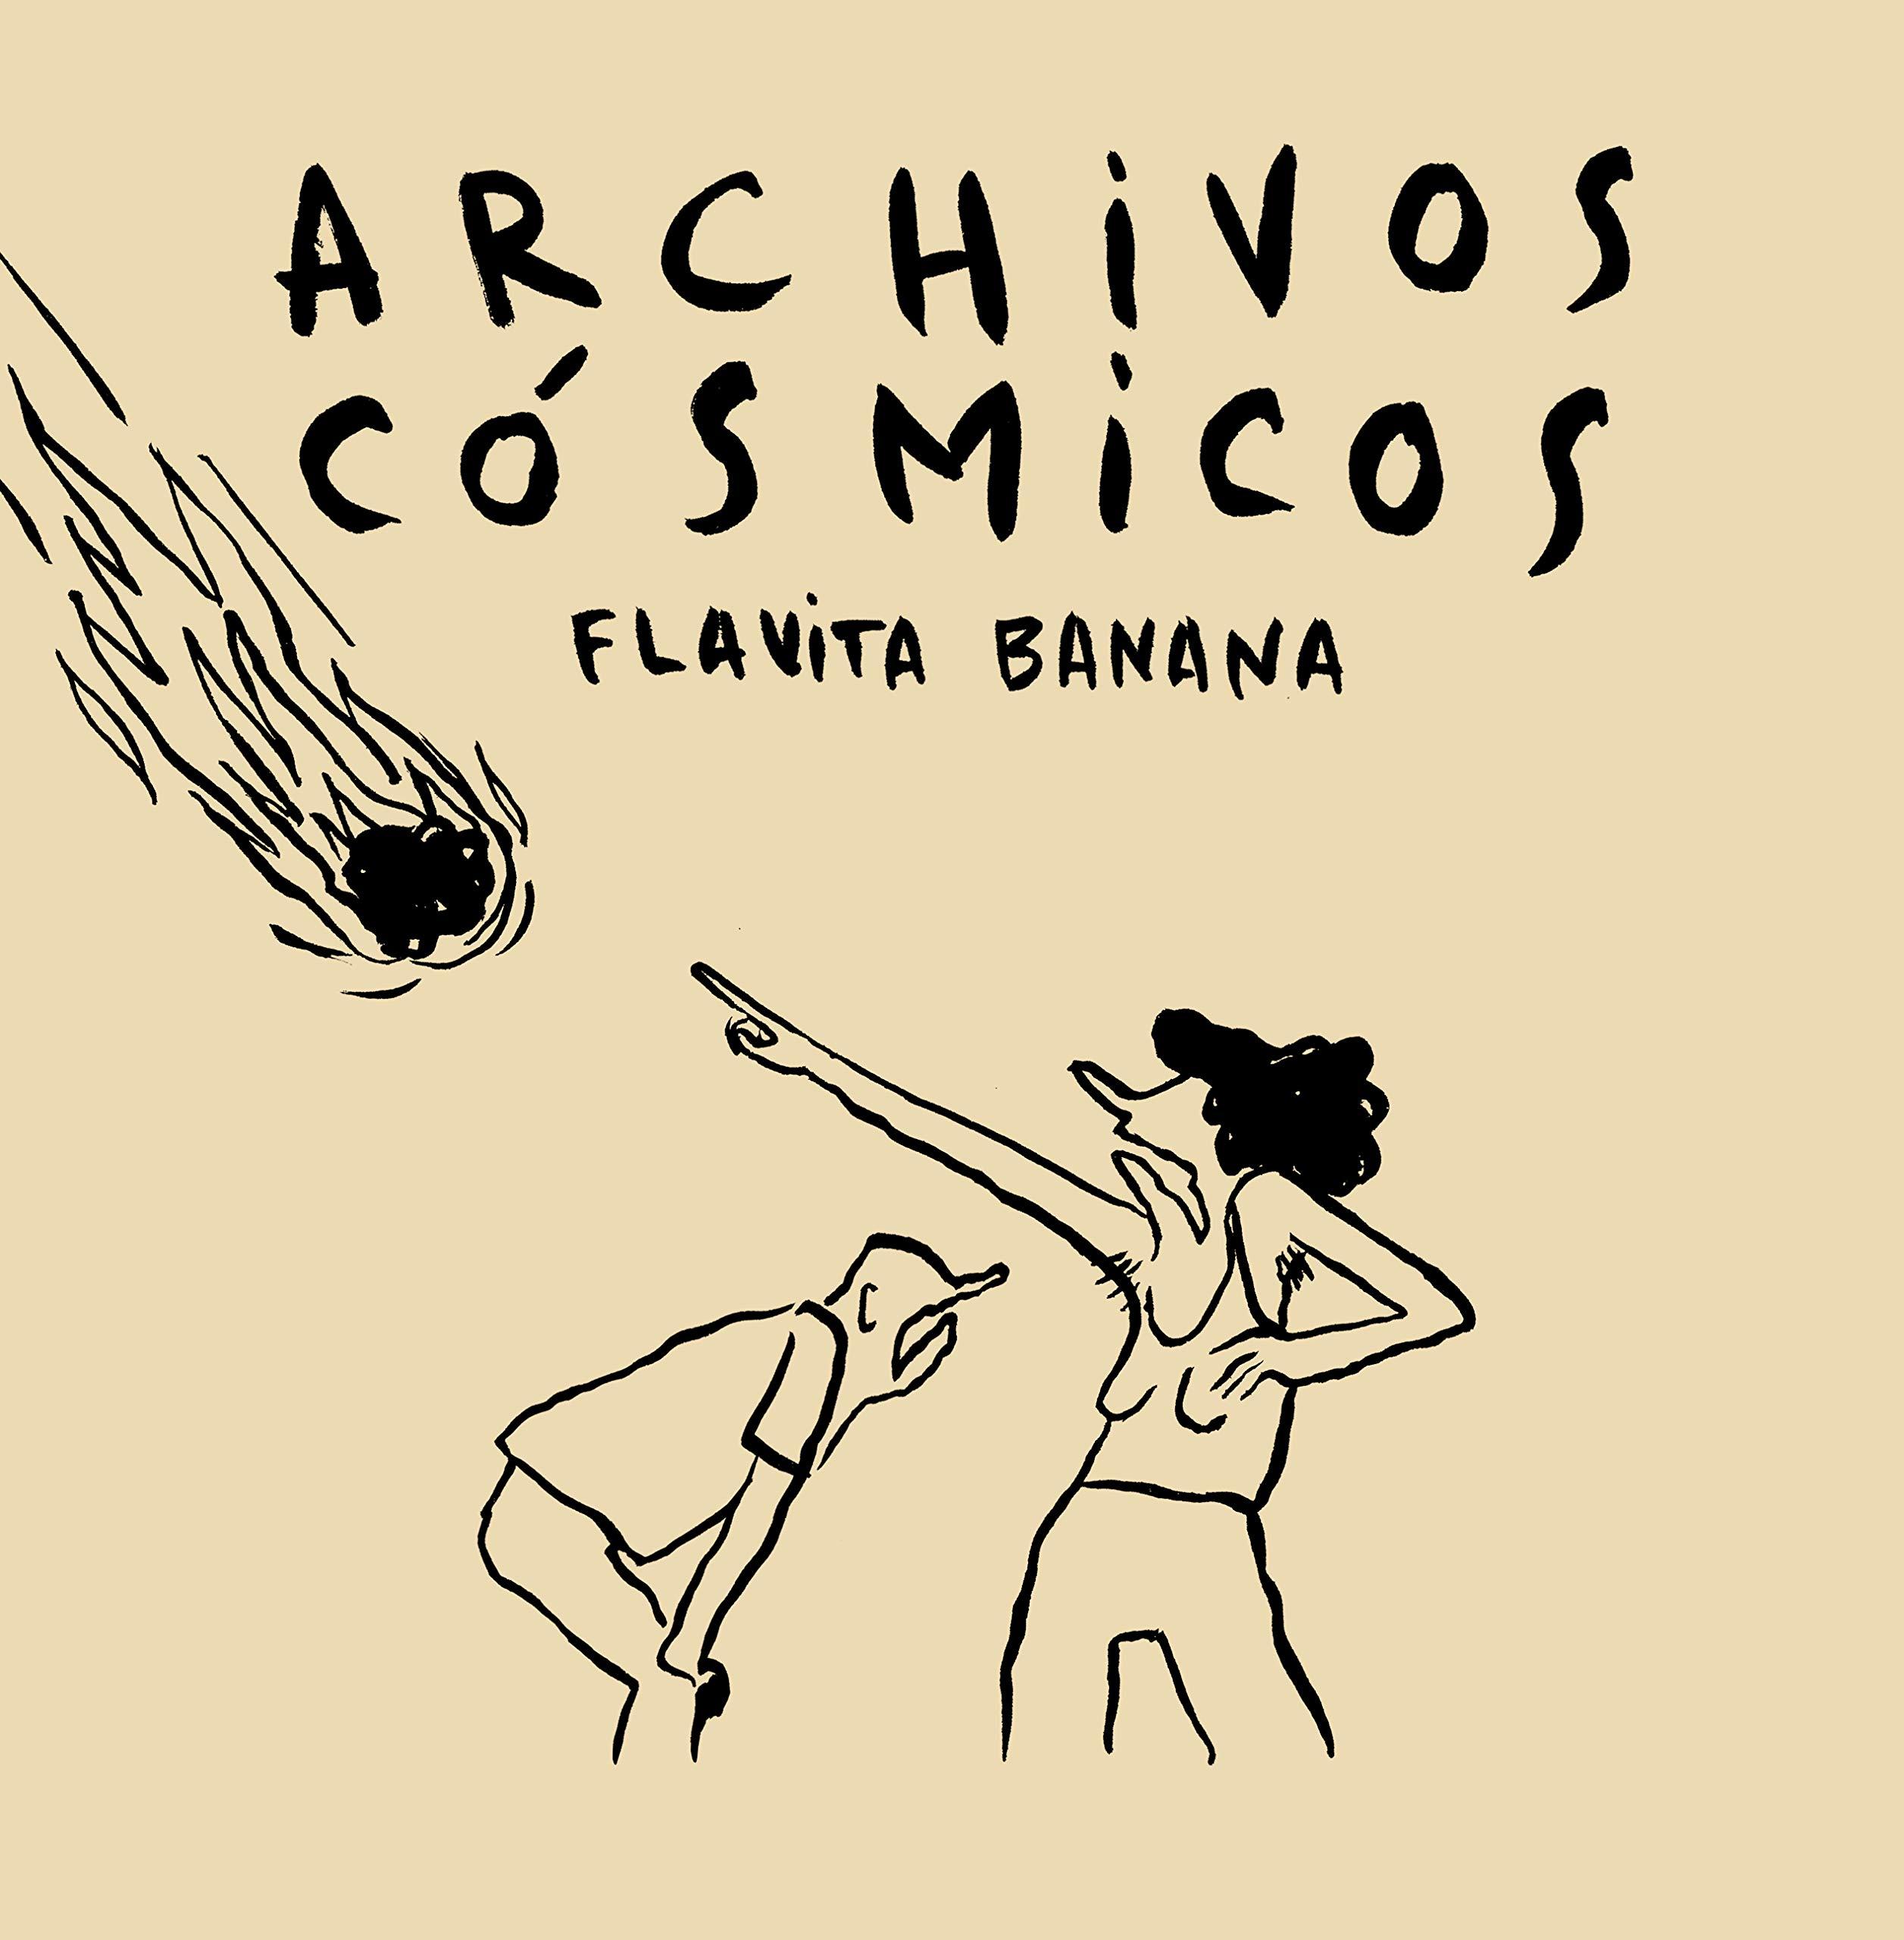 Archivos cósmicos (¡Caramba!)